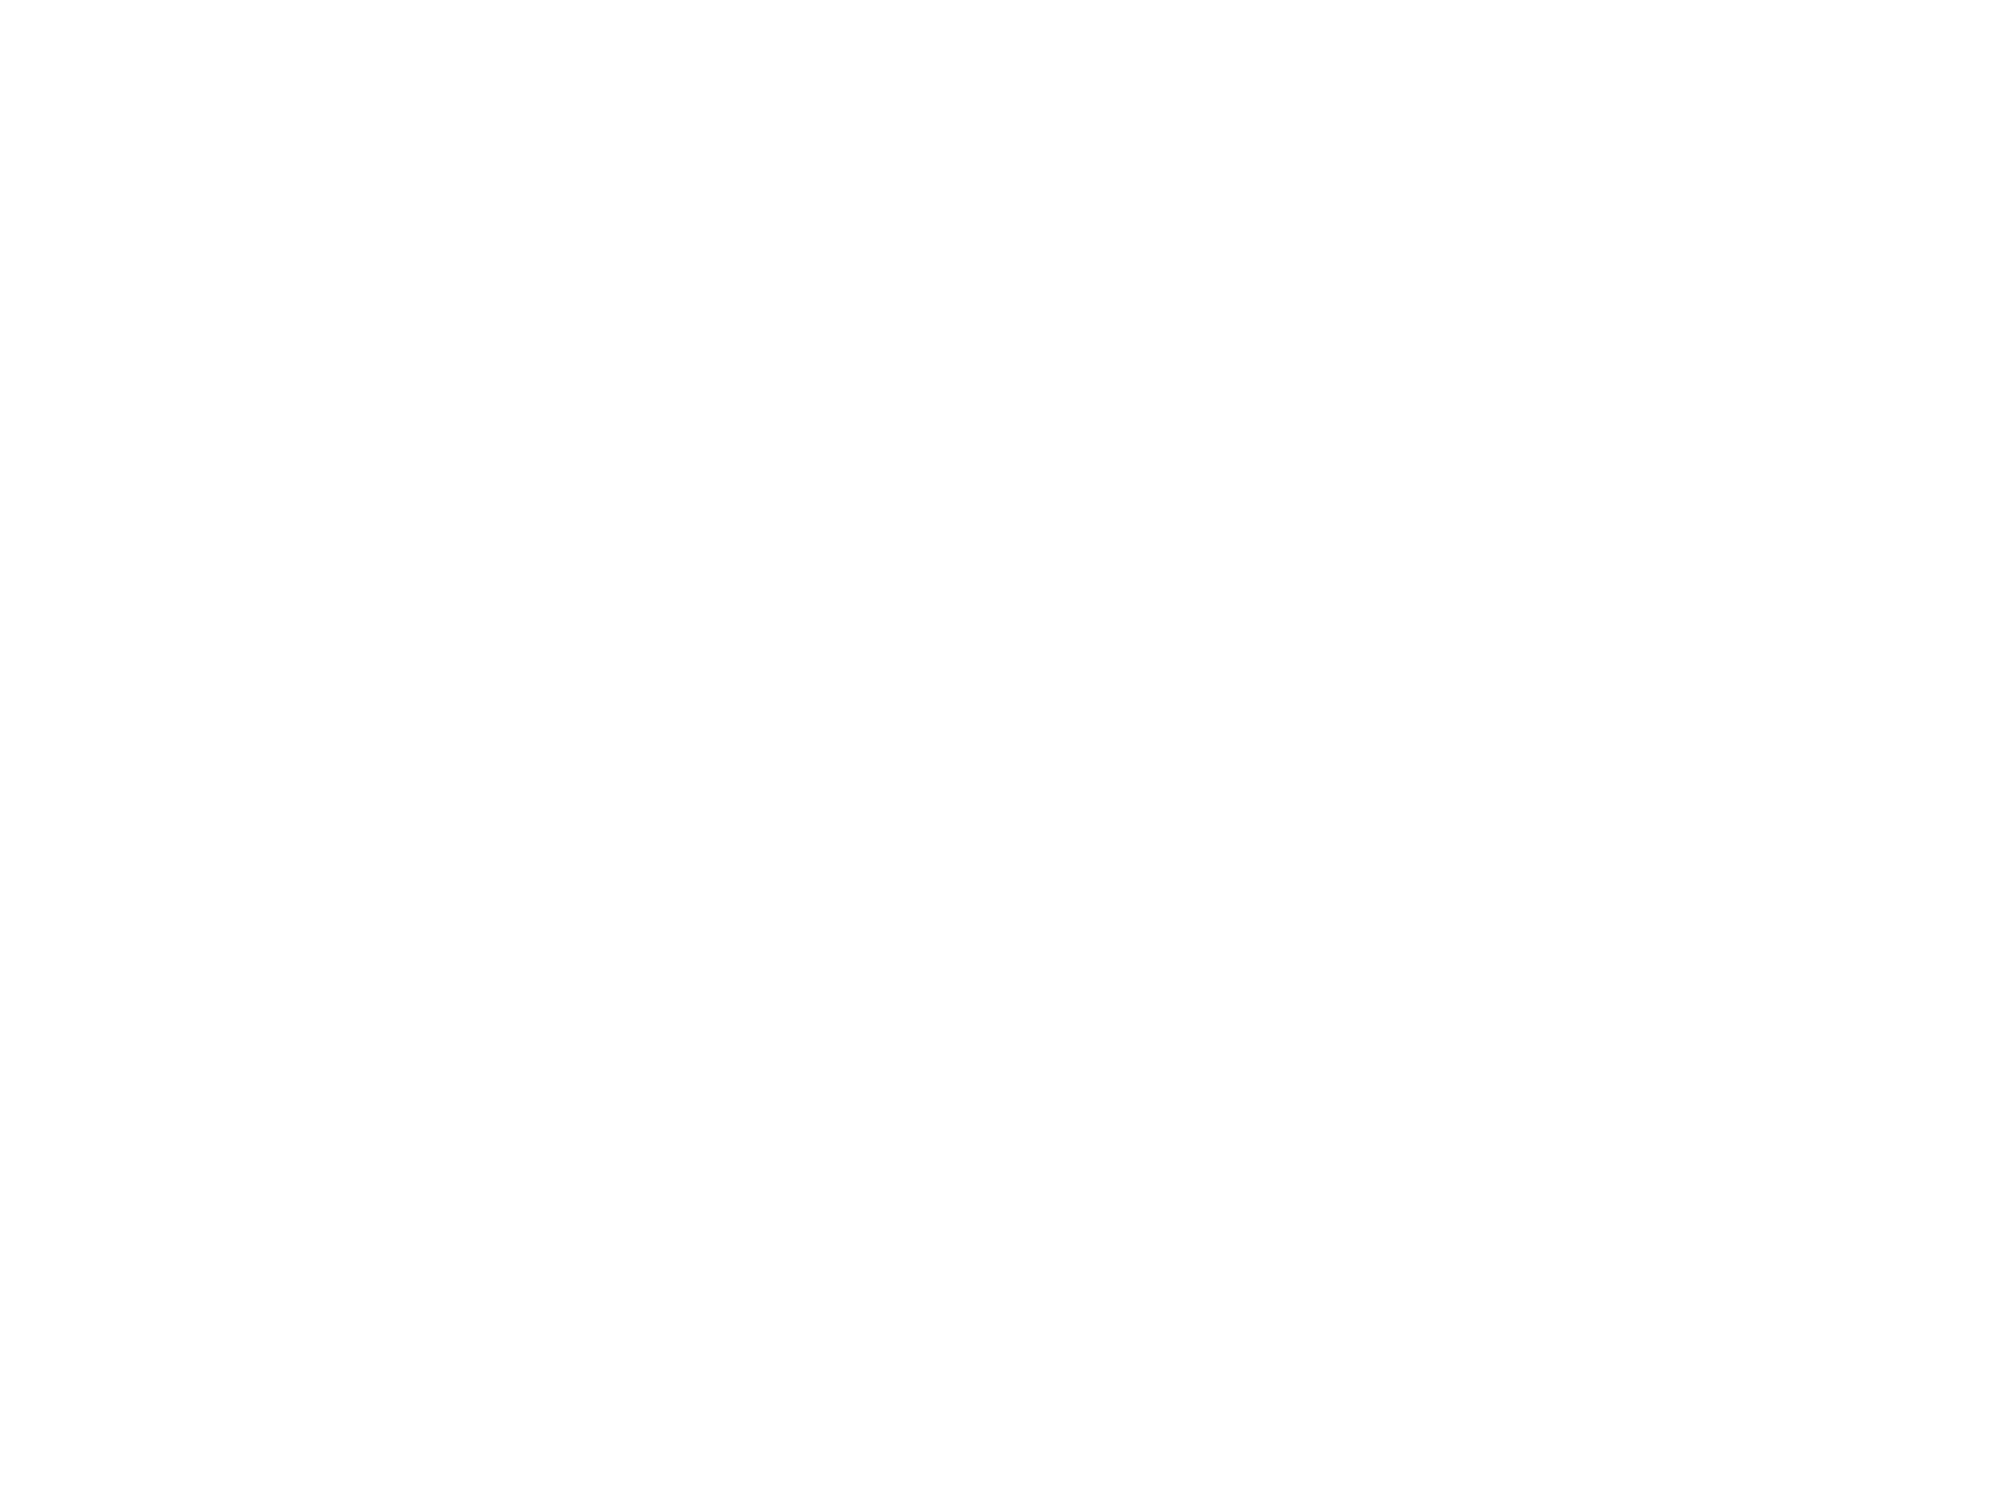 web-logo-tivoli-audio.png